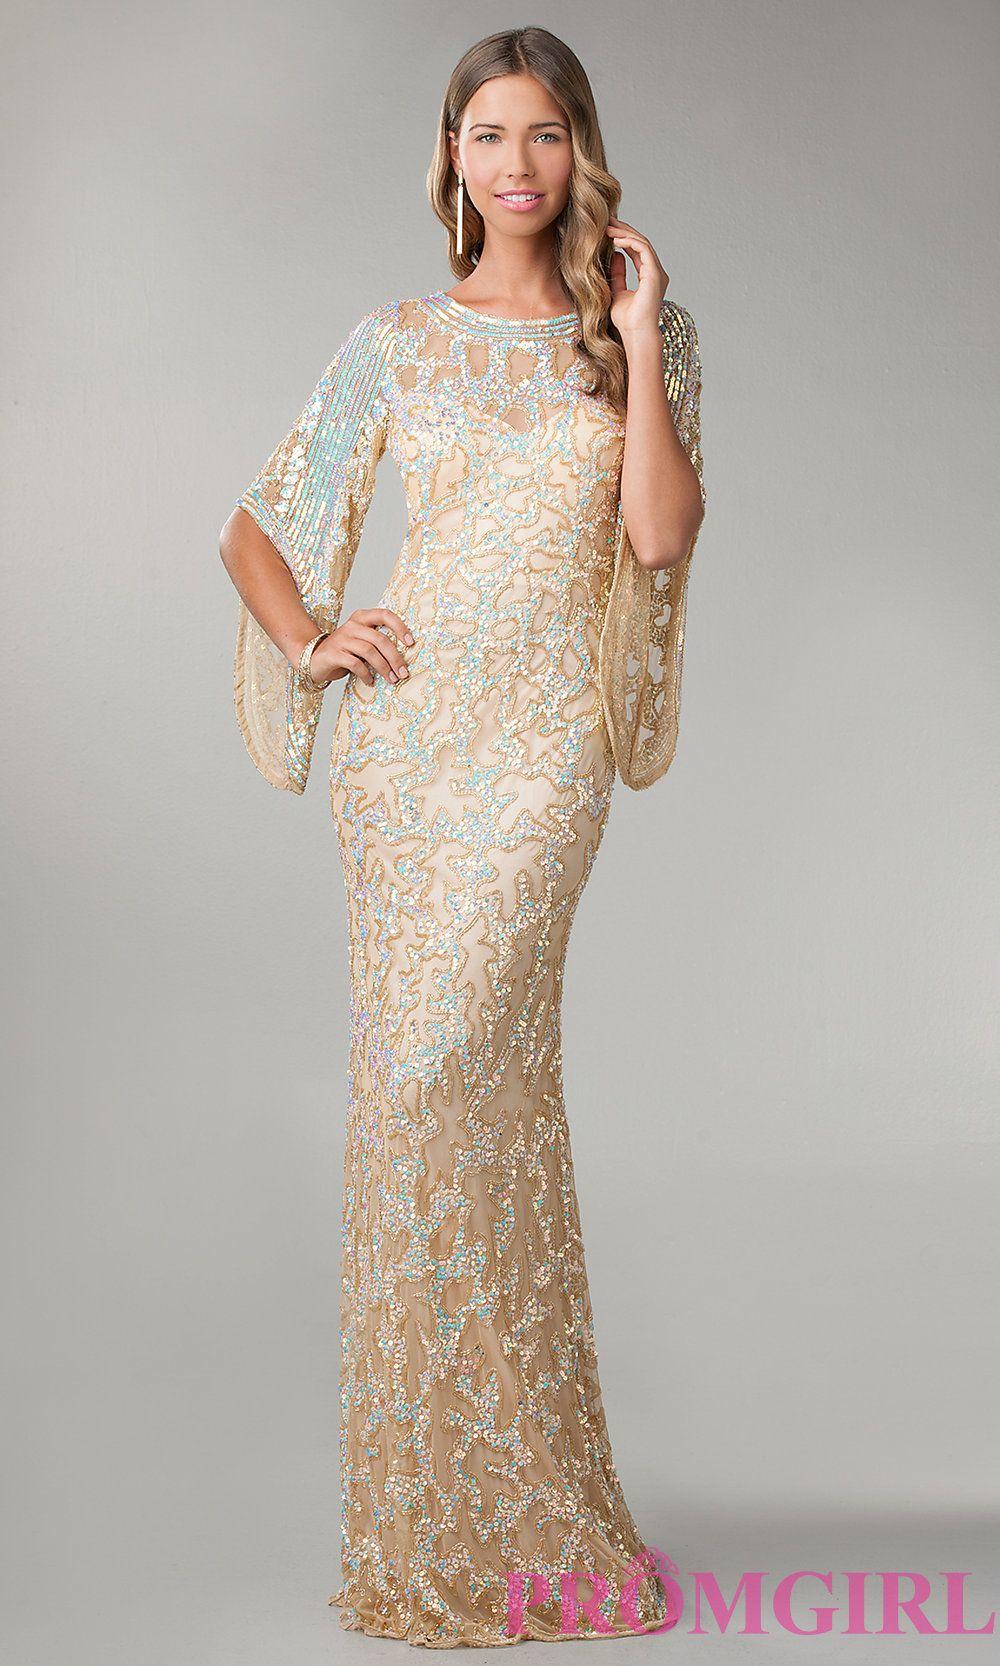 Long-Sleeve Bateau-Neck Sequin Prom Dress - PromGirl